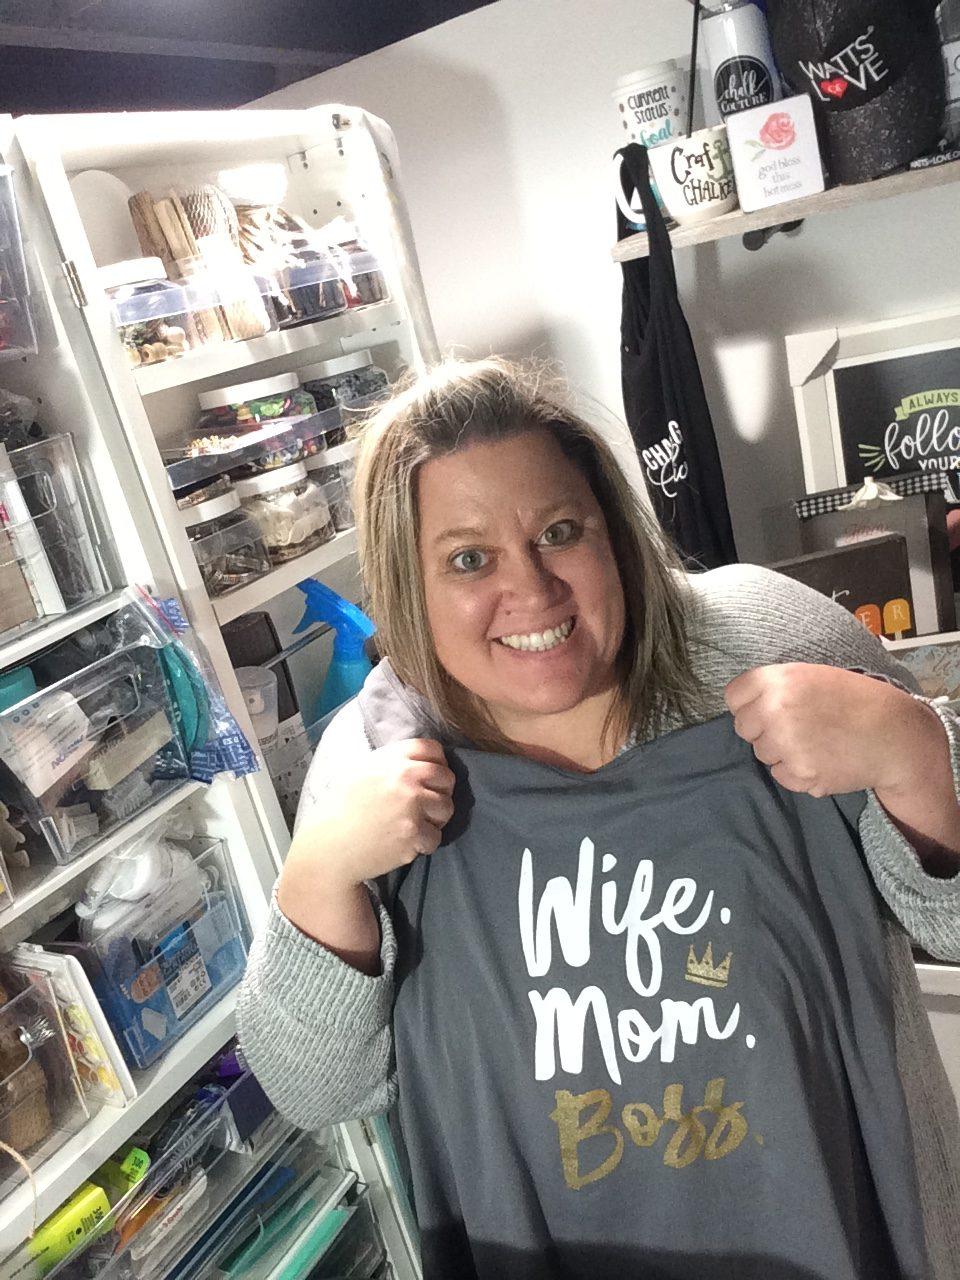 Wife. Mom. Boss. Transfer on Tank Top